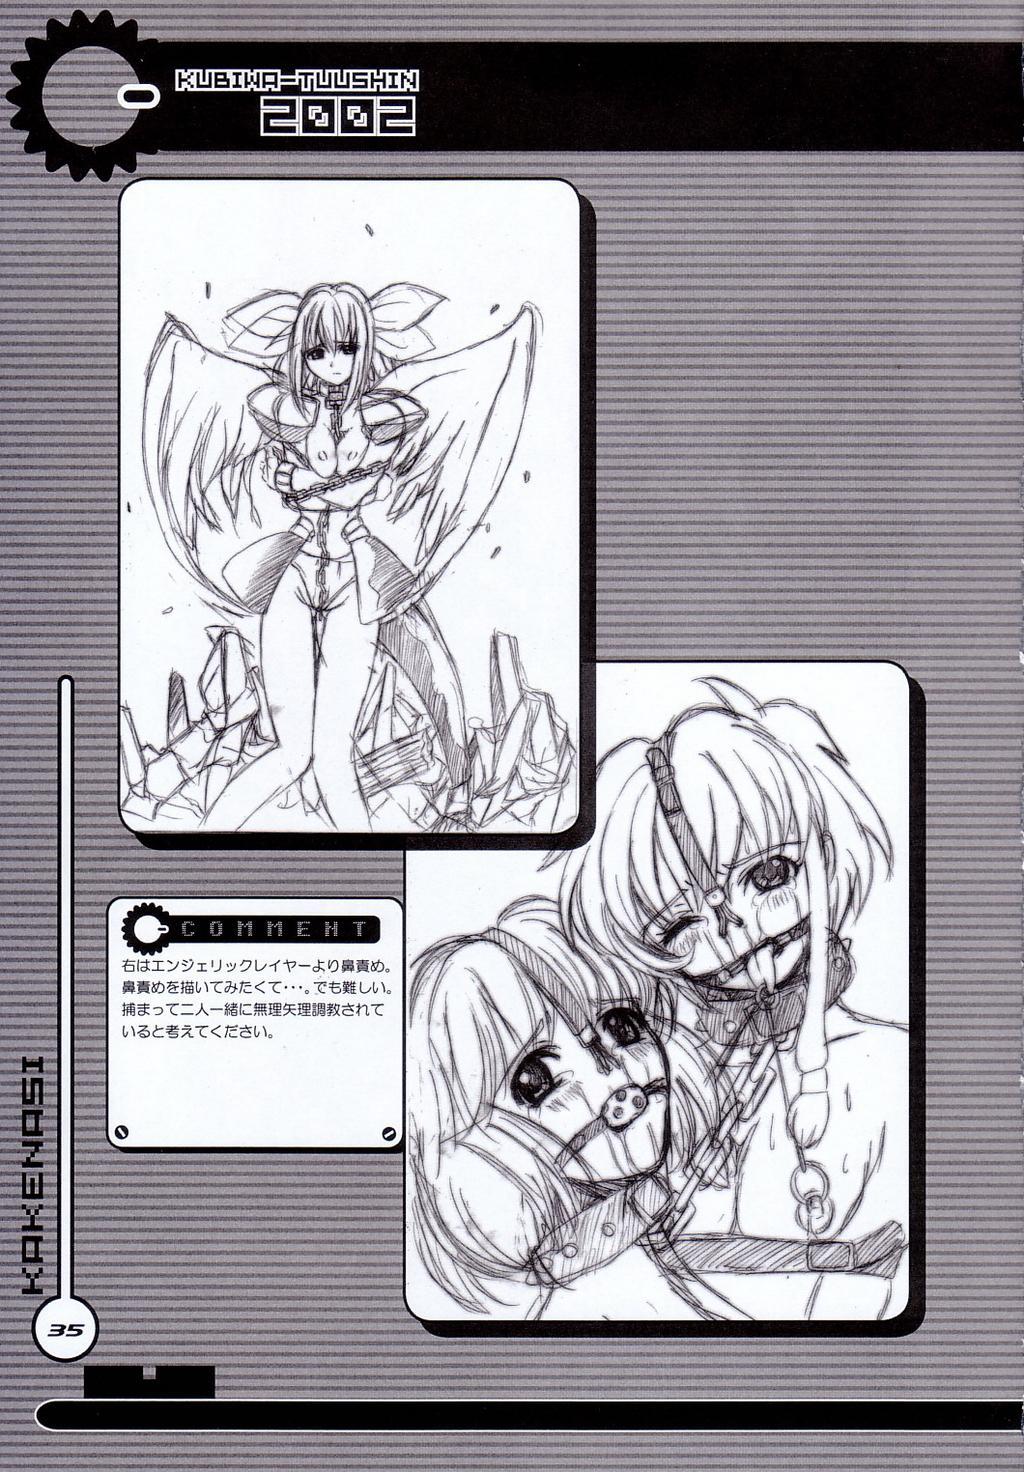 Kubiwa Tsuushin Volume 4 33